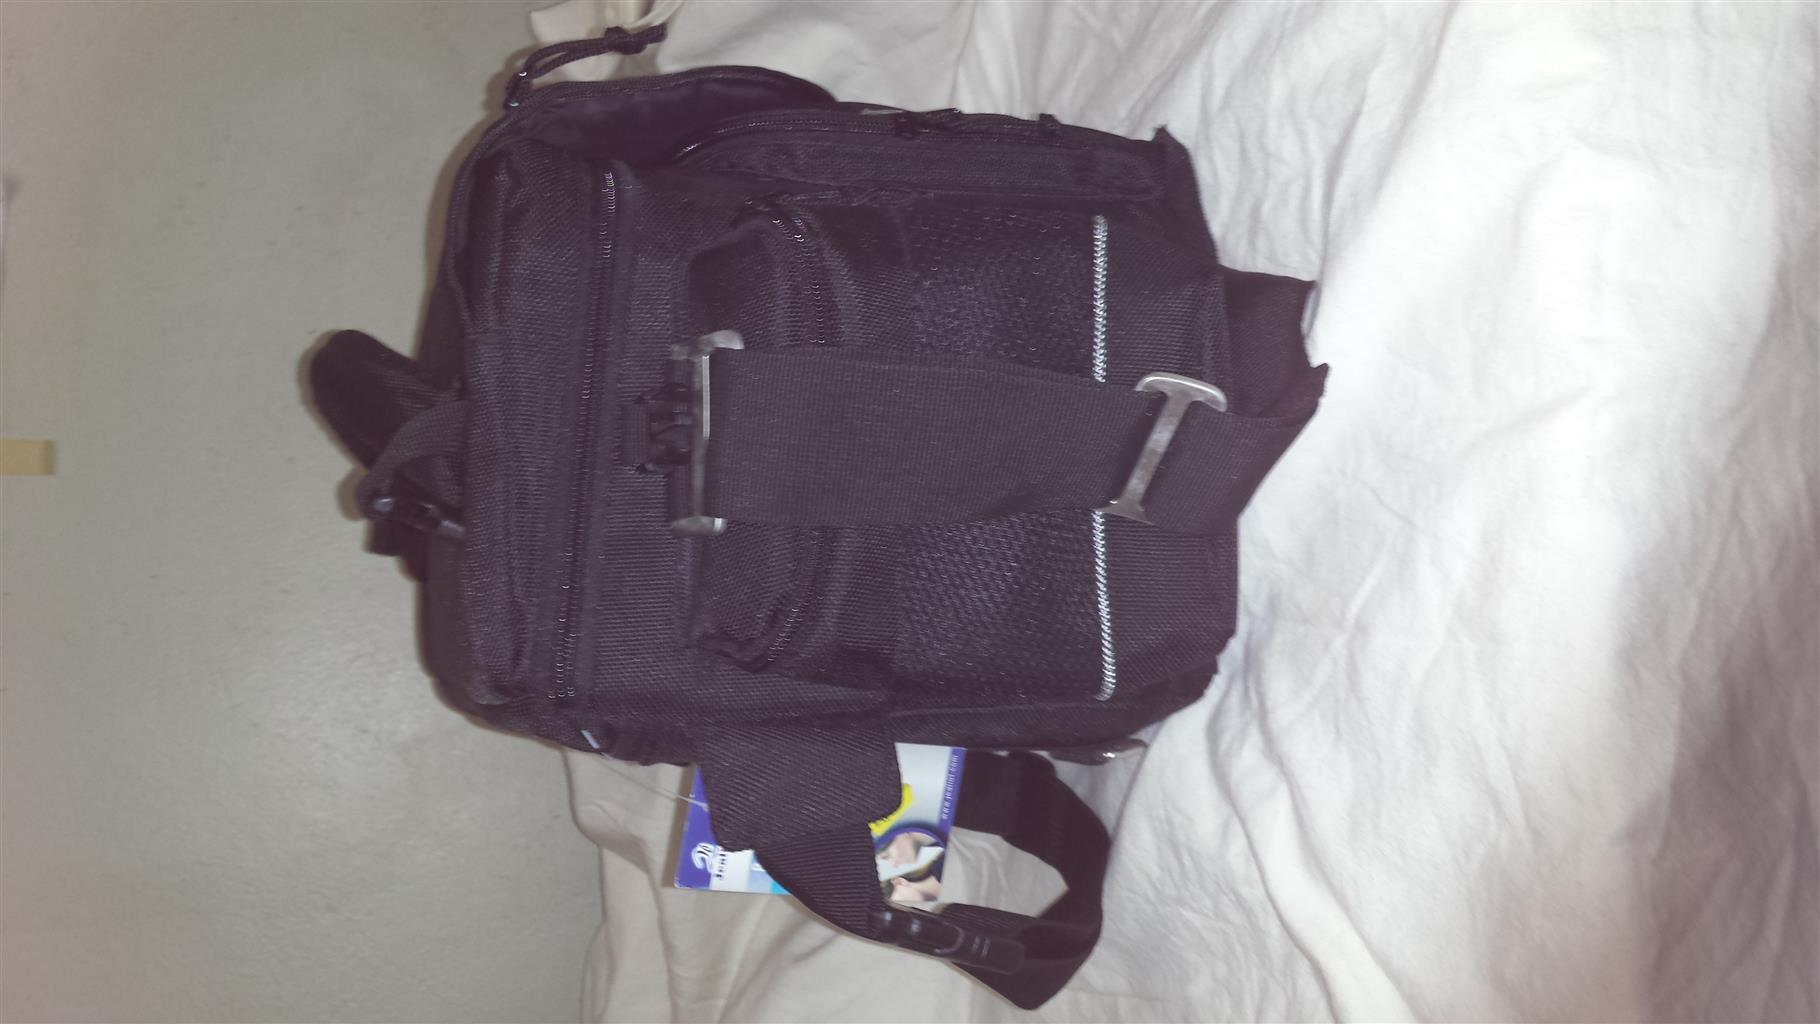 Jealiot A2209 Camera Bag - square type